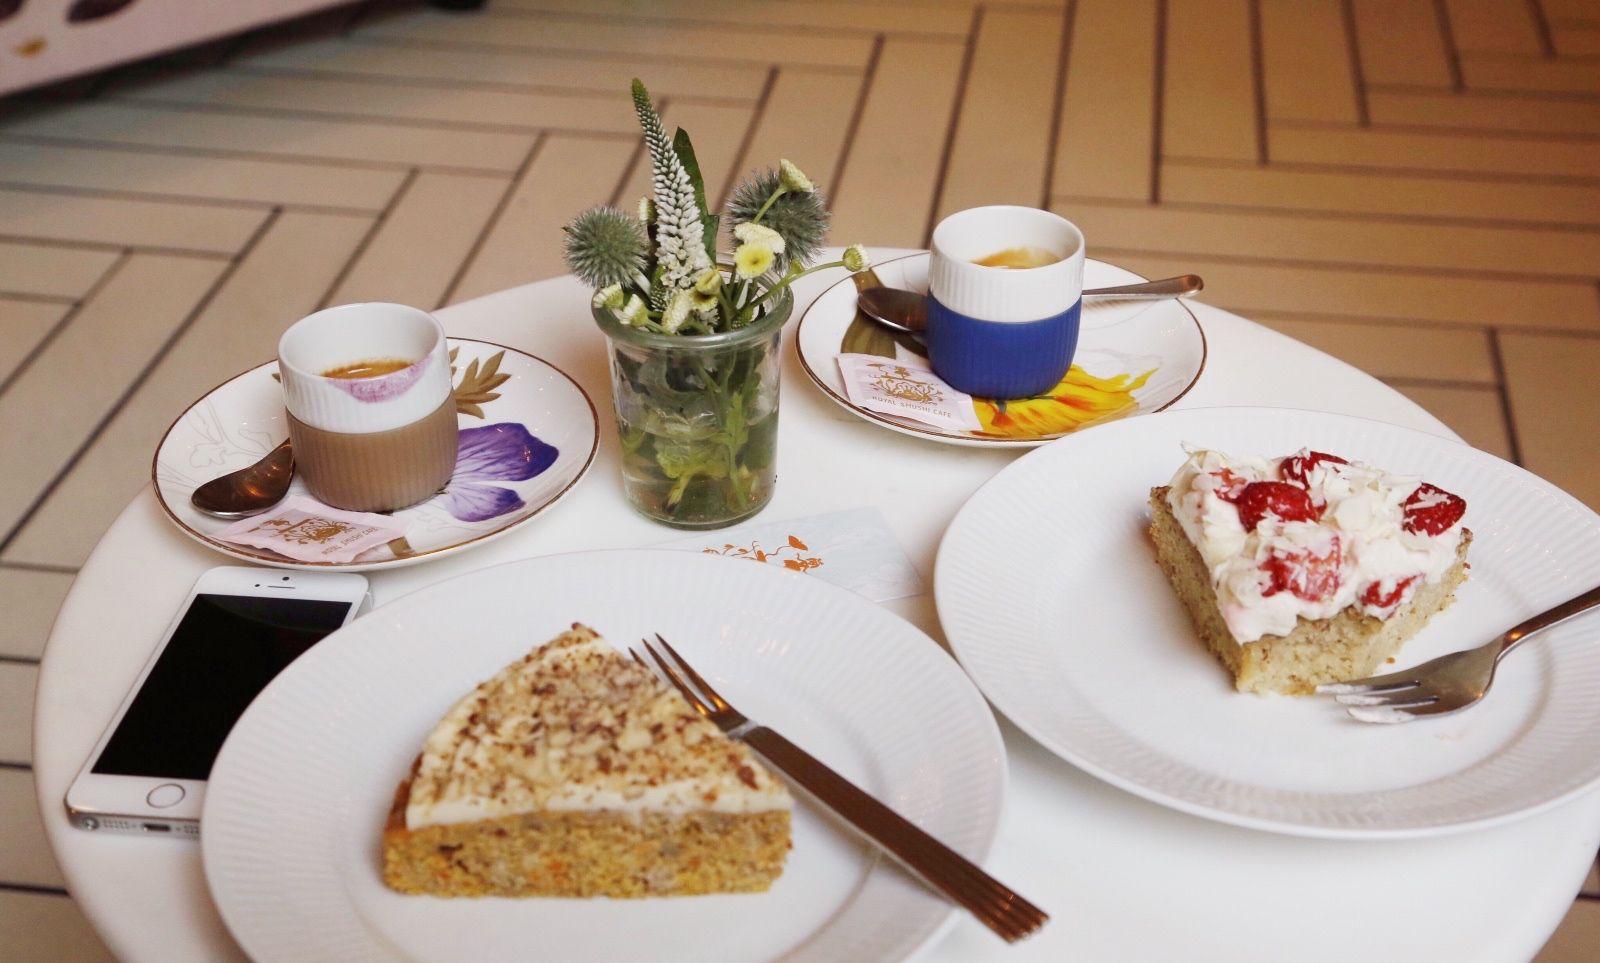 Royal Smushi Cafe x Charity Bakery